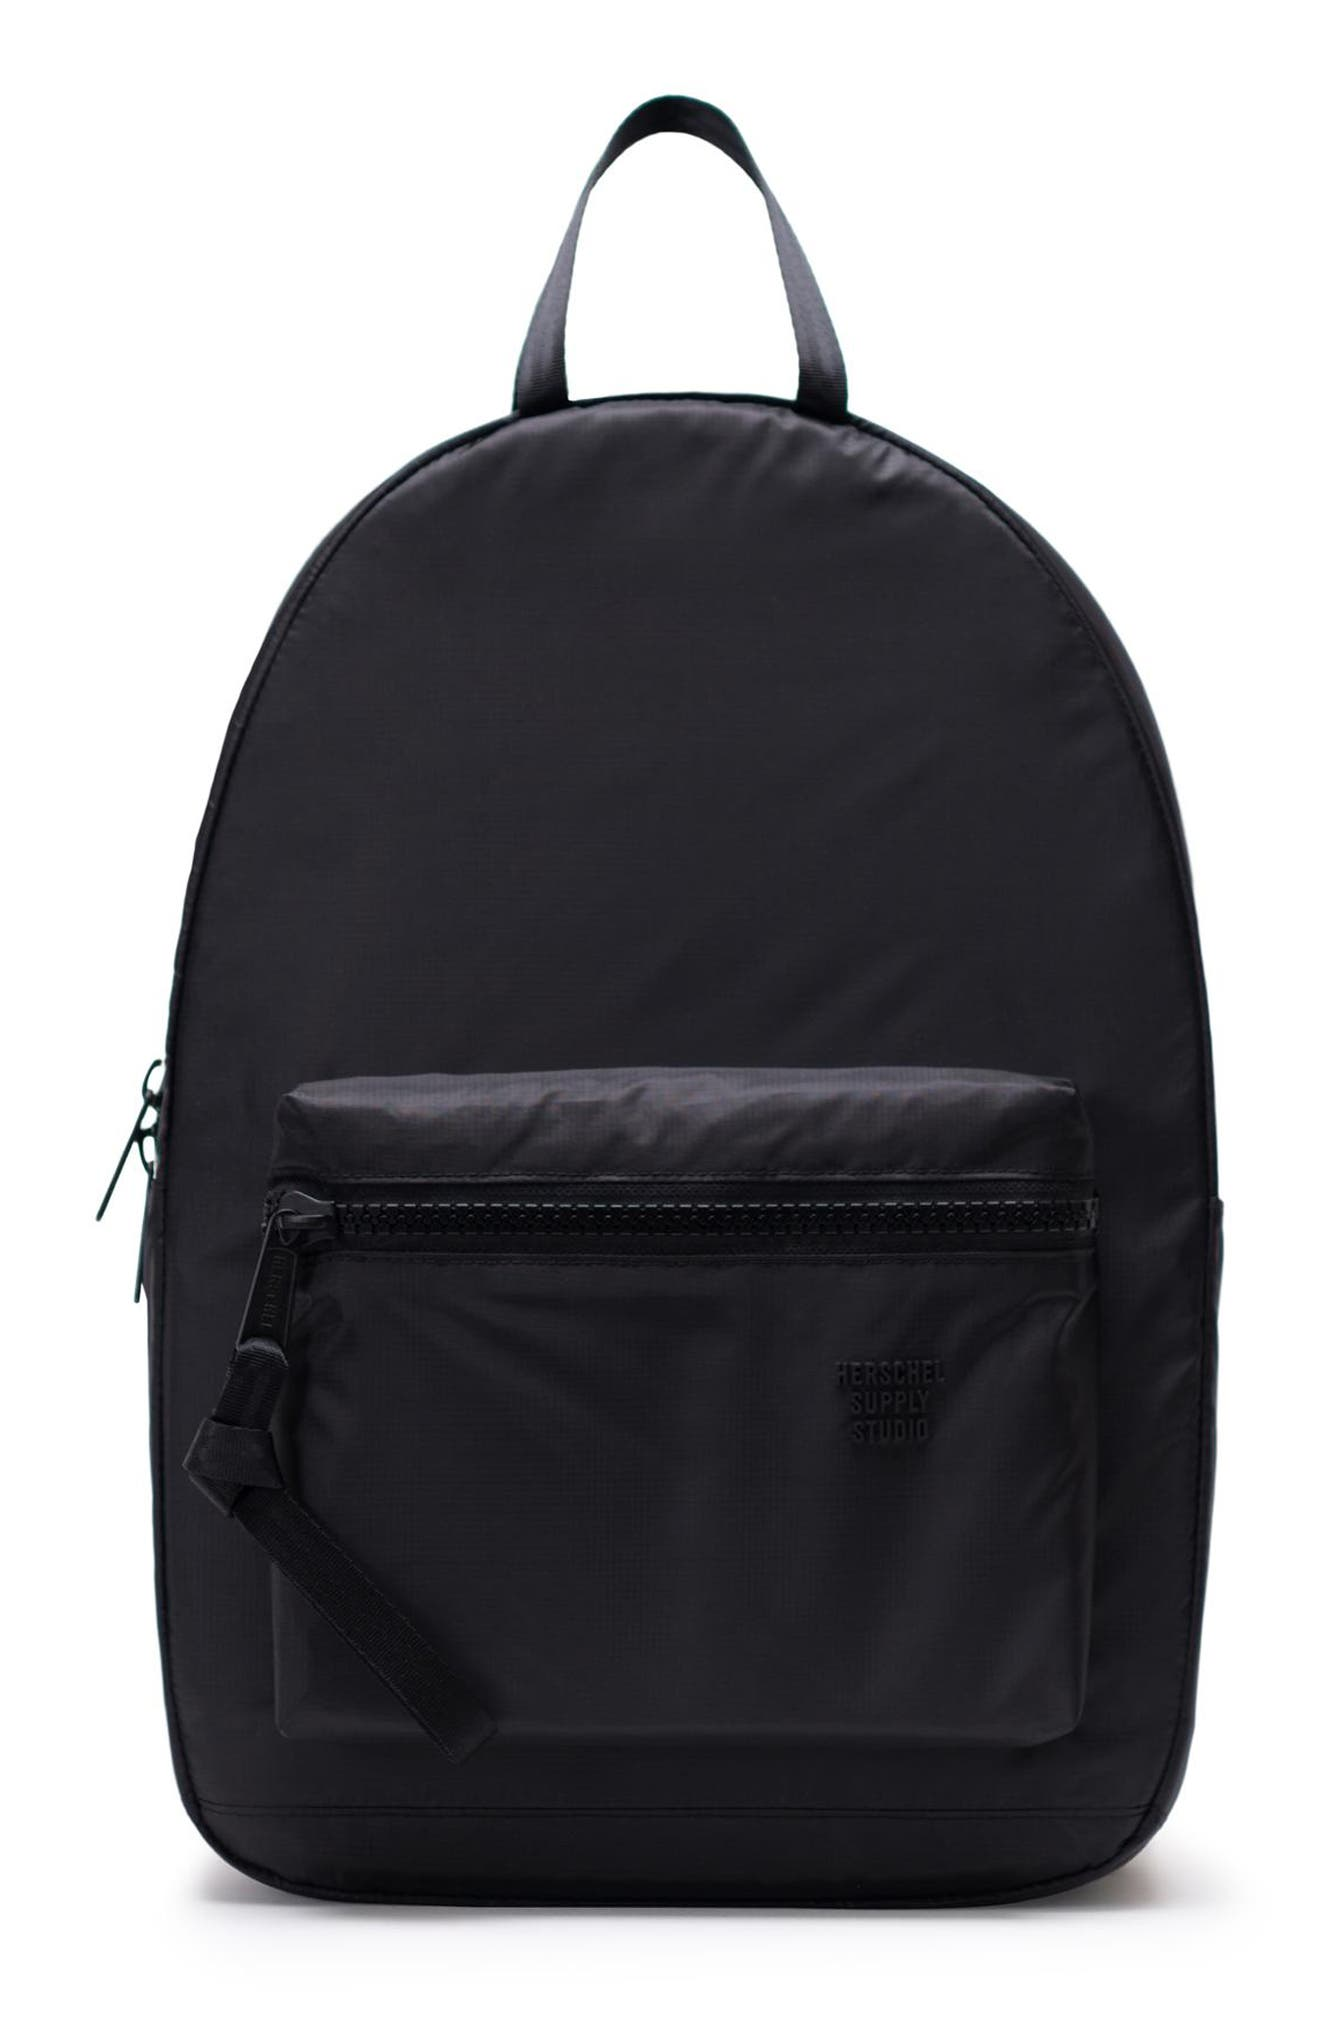 Herschel Supply Co. Hs6 Studio Collection Backpack - Black